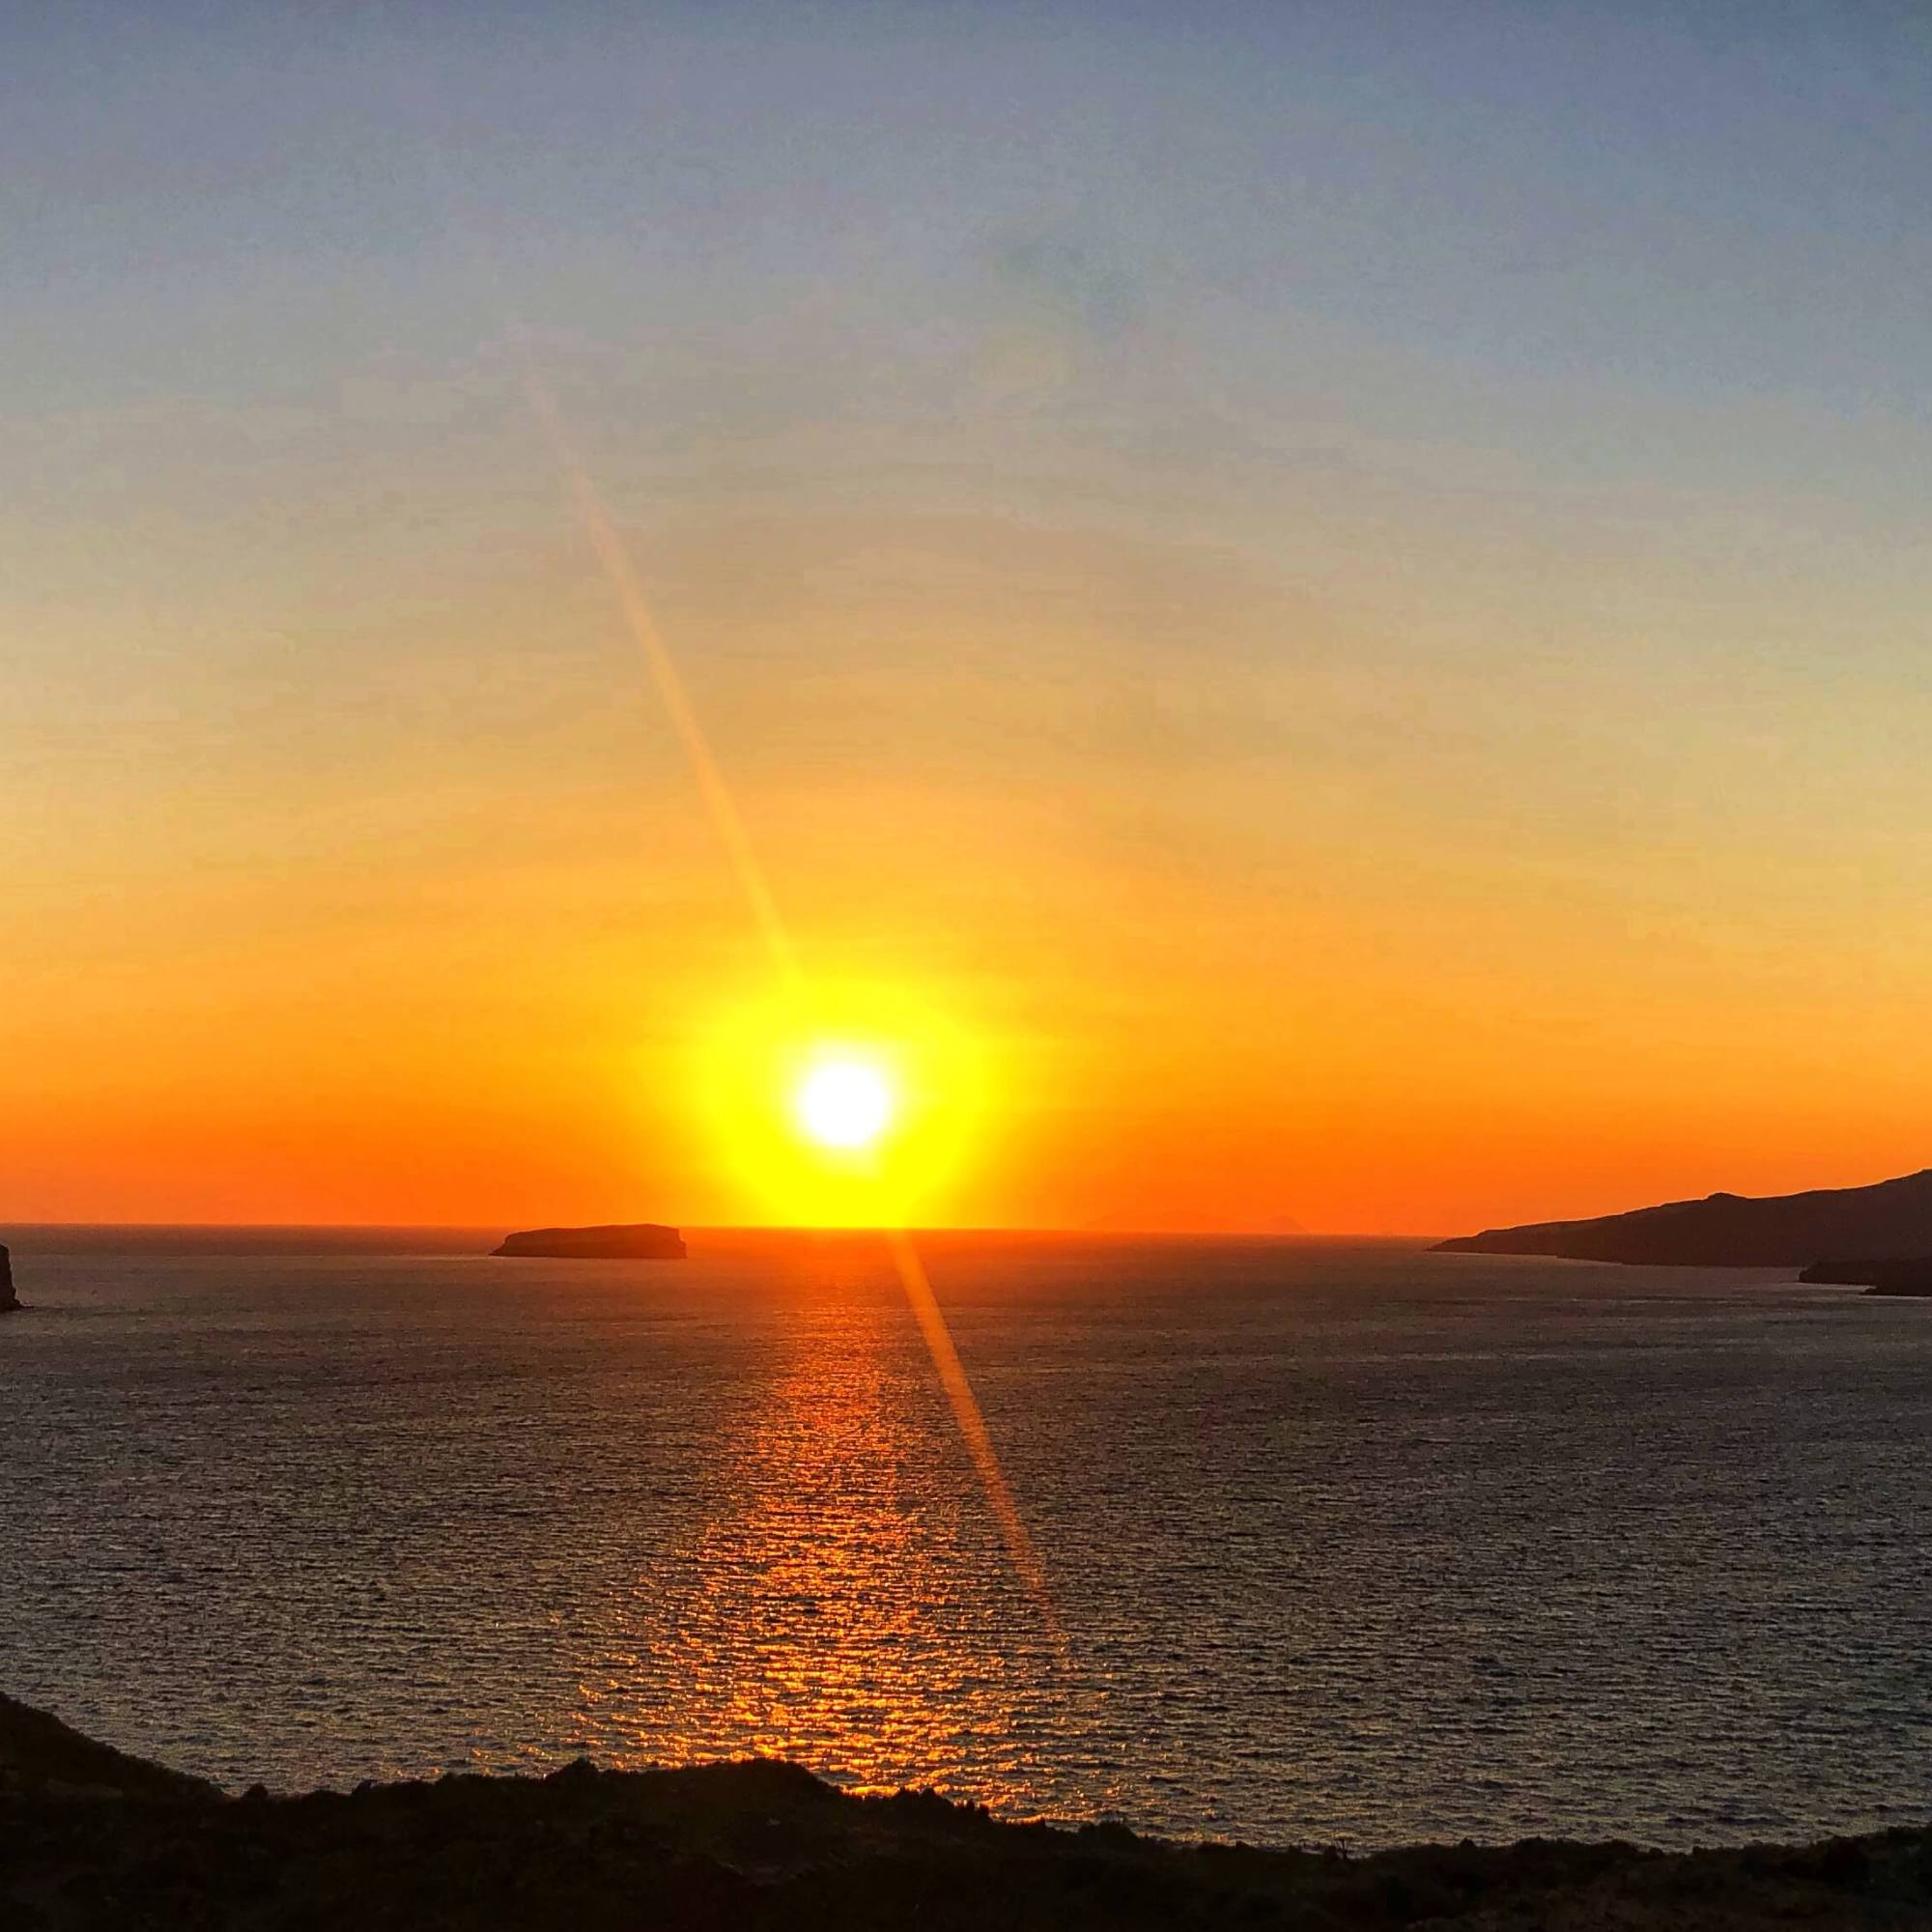 coucher-de-soleil-caldera-view-santorin